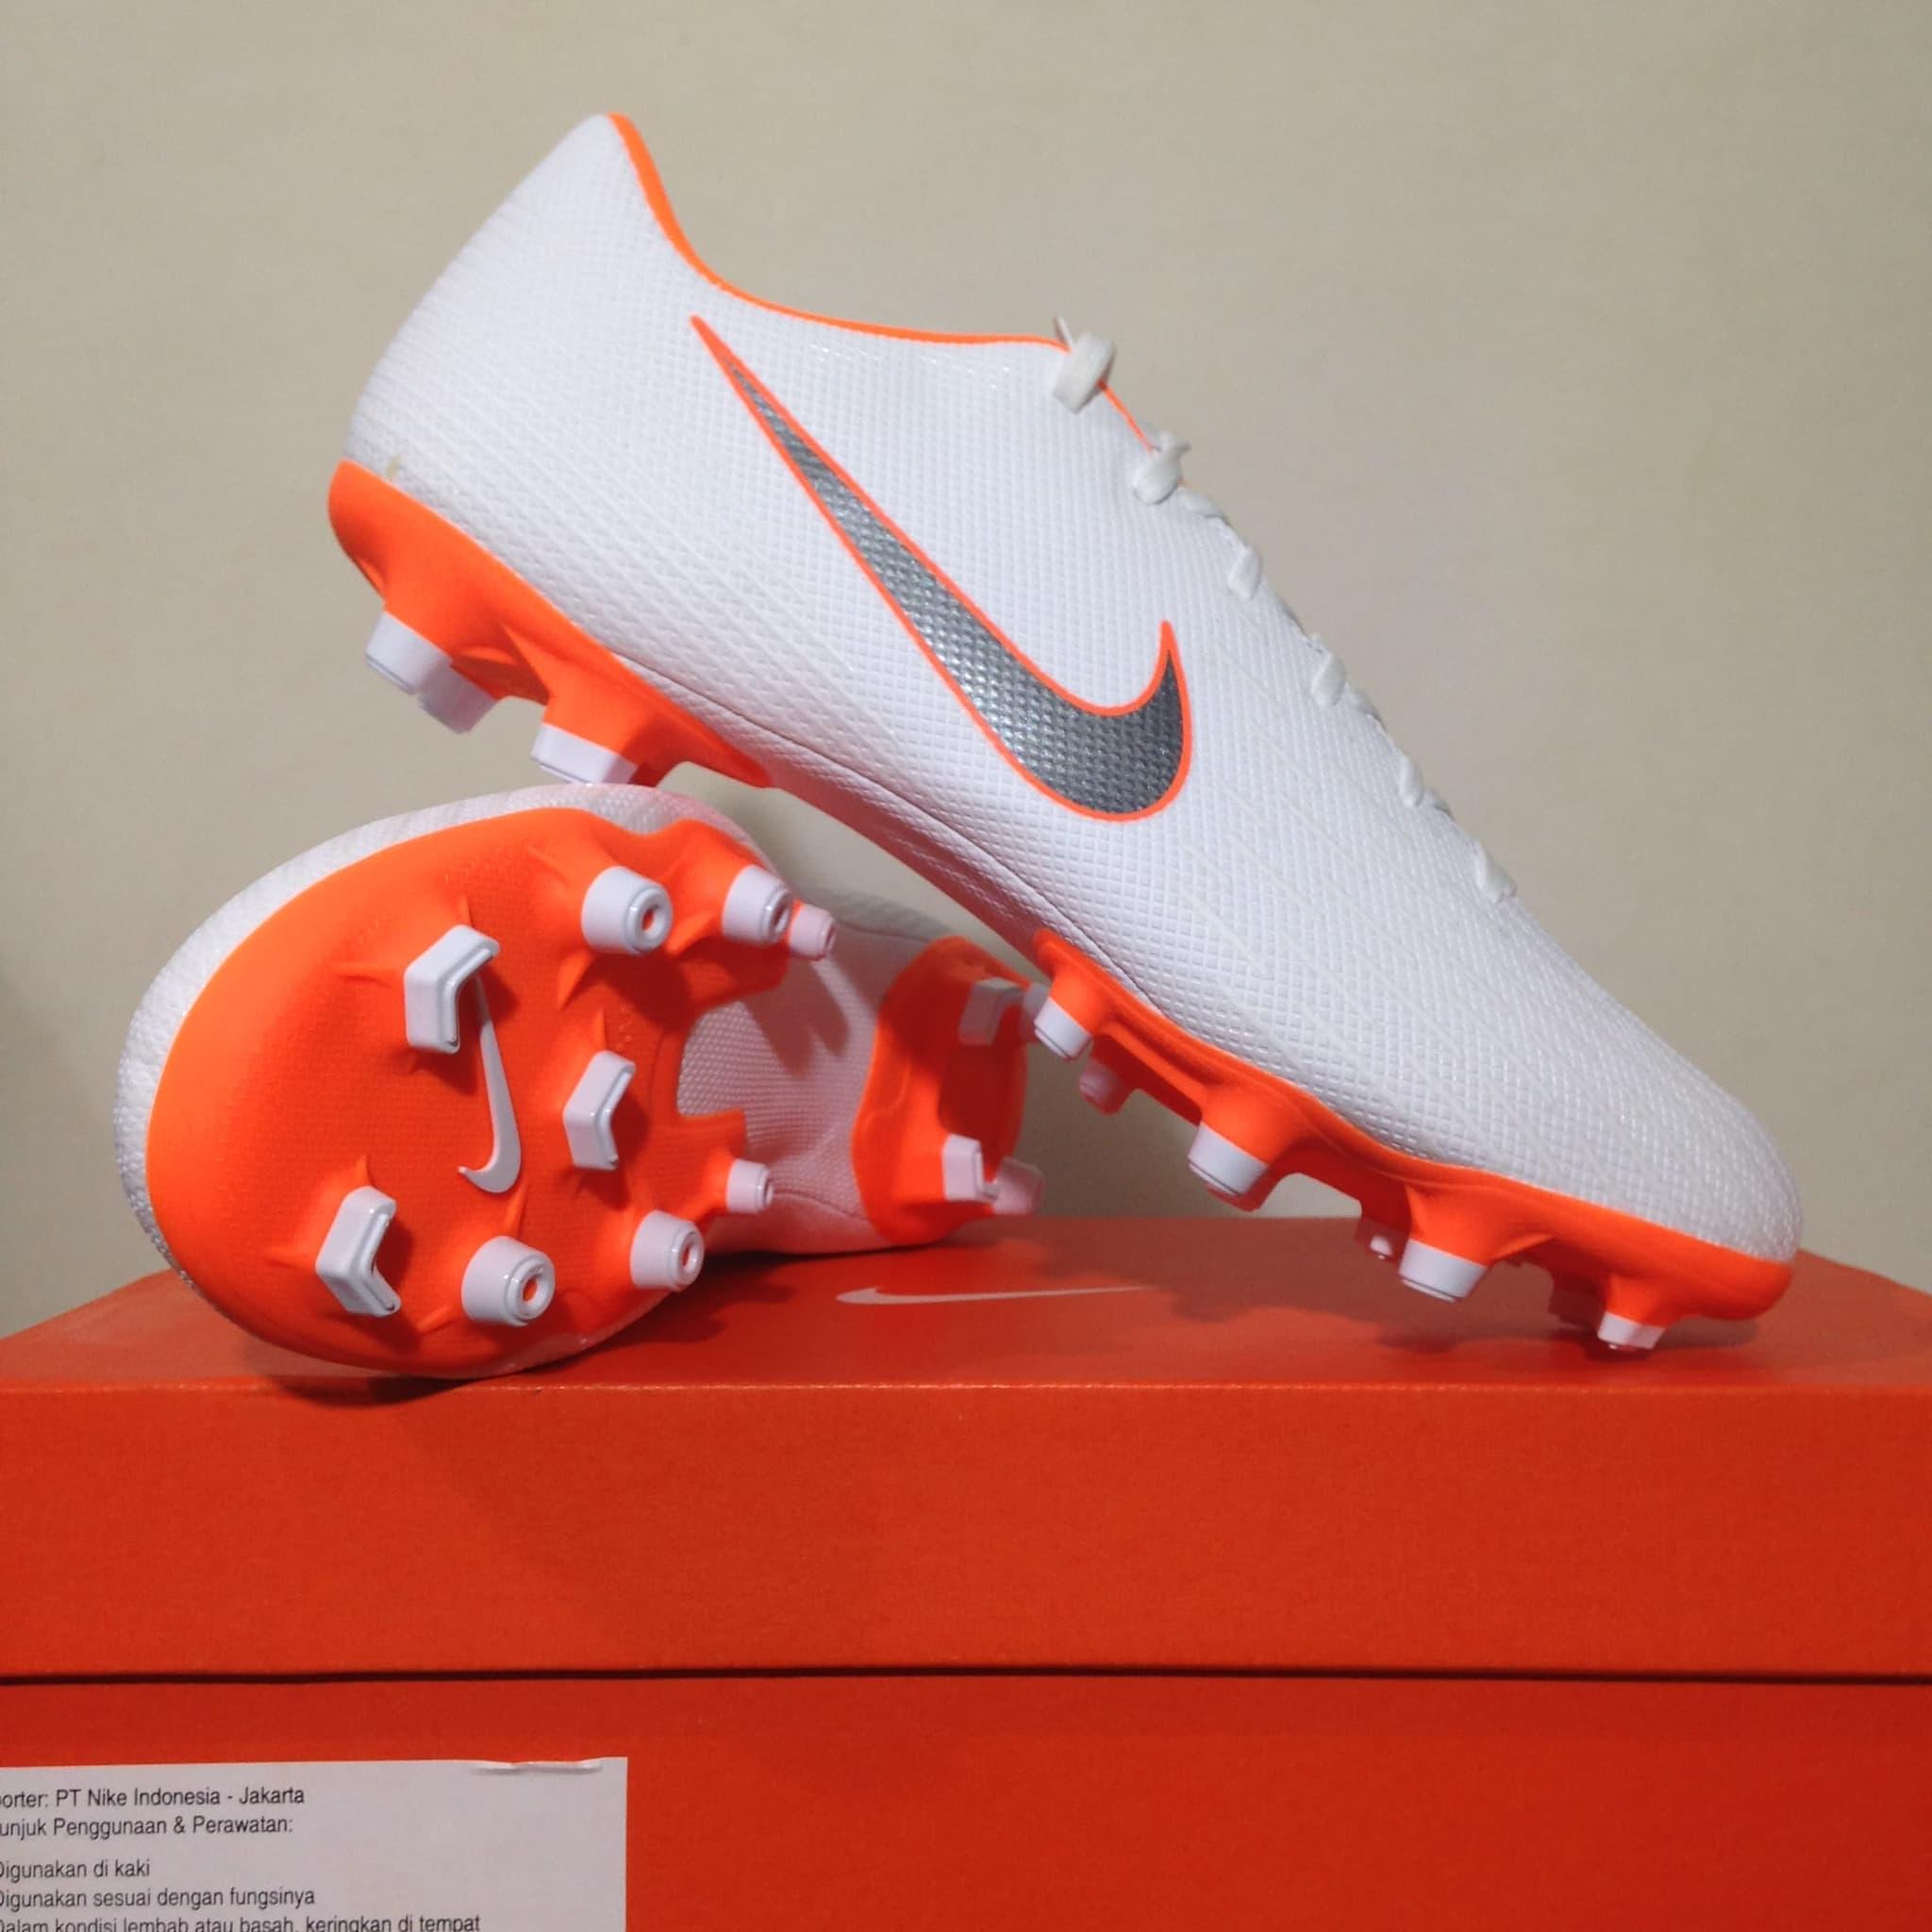 Jual Sepatu Bola Nike Vapor 12 Academy FG/MG White Orange